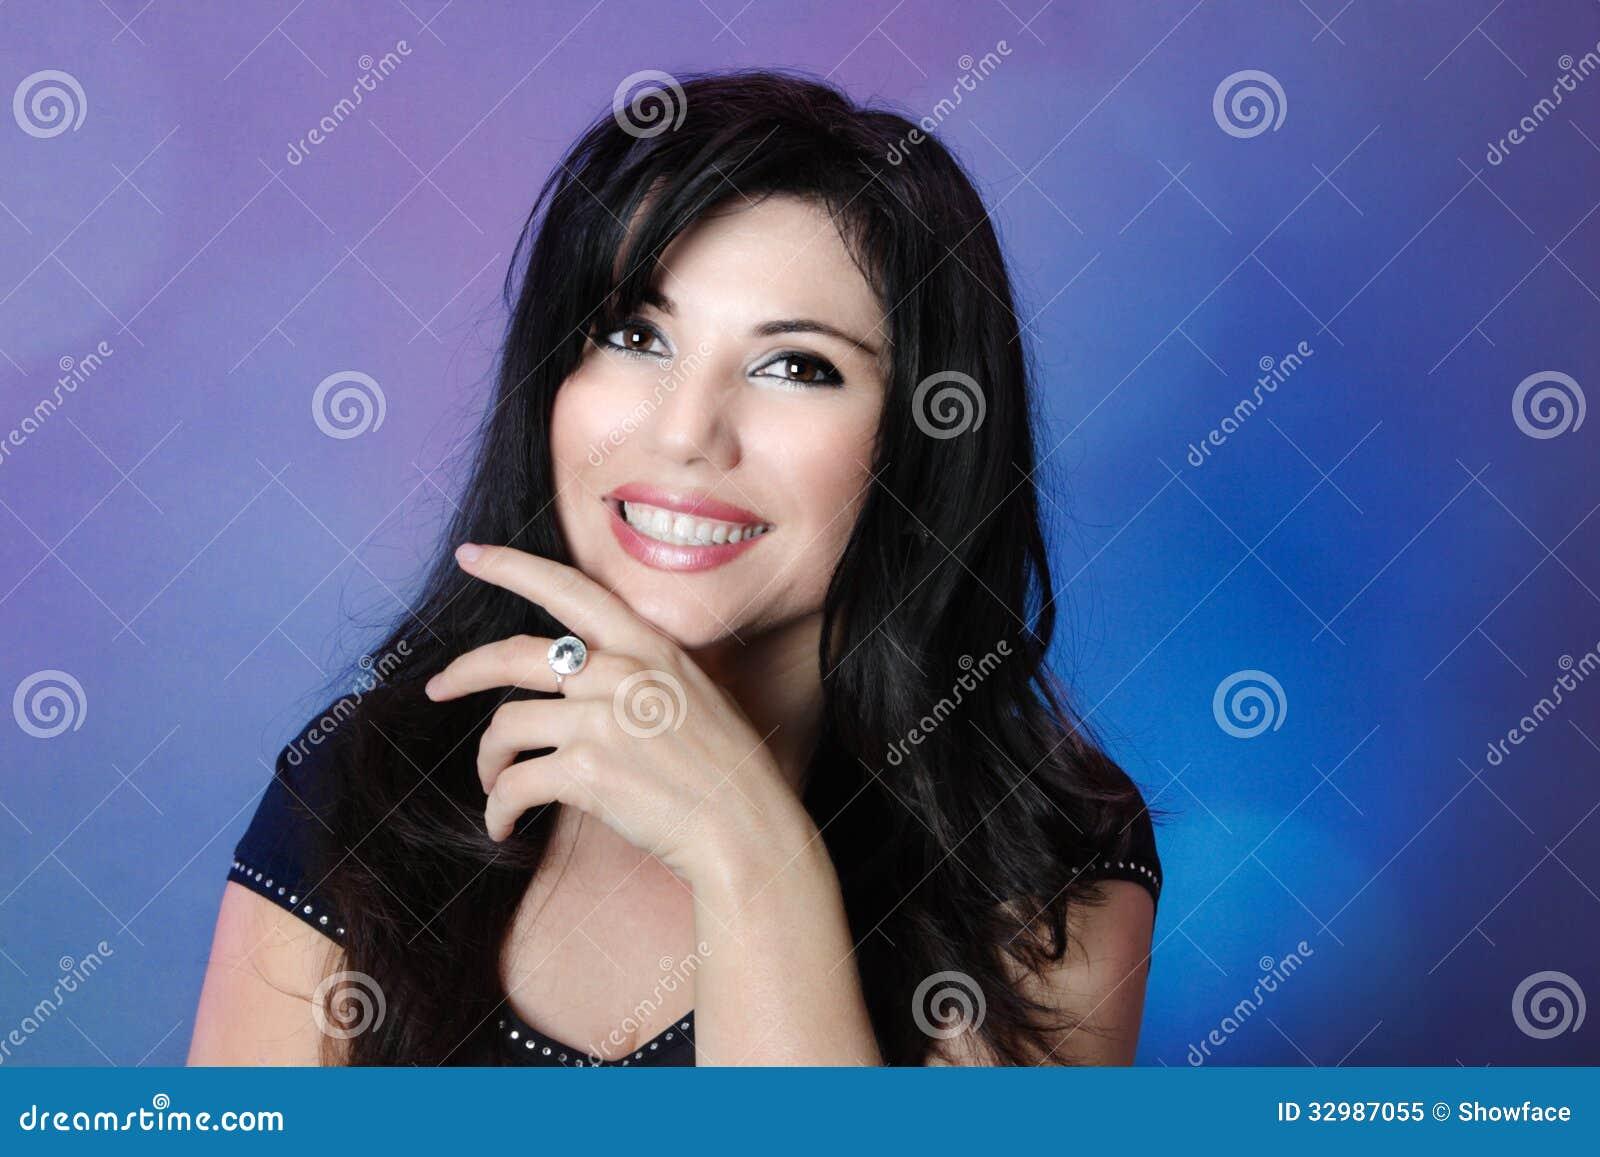 Mulher bonita com cabelo preto lustroso e sorriso feliz grande